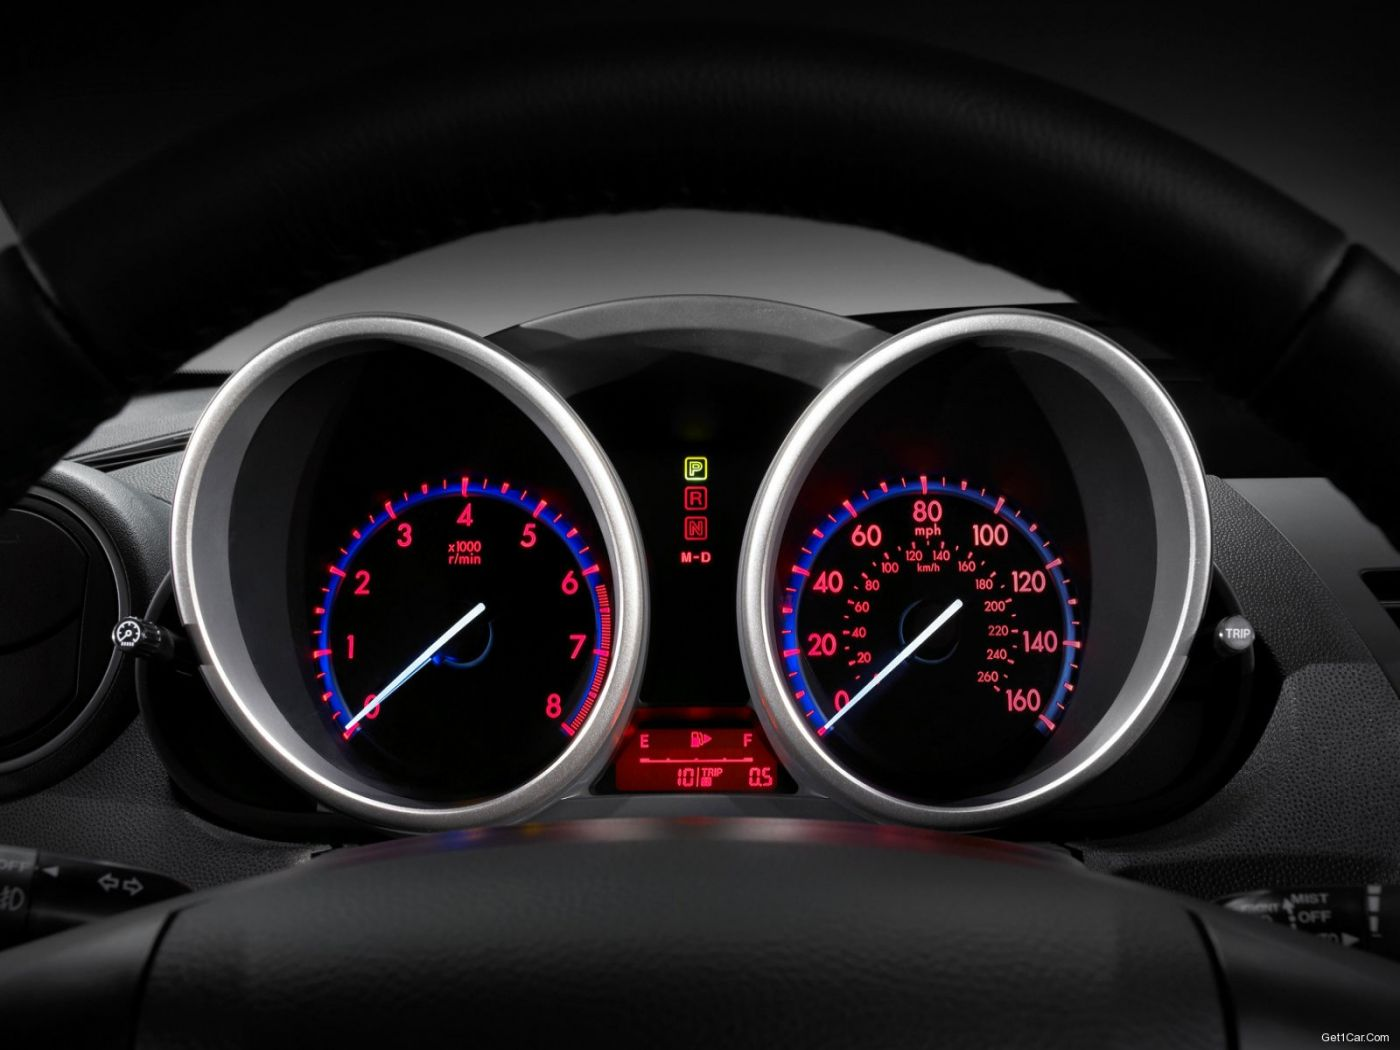 Mazda 3 2010 Sedan Instrument Panel Wallpaper 1400x1050